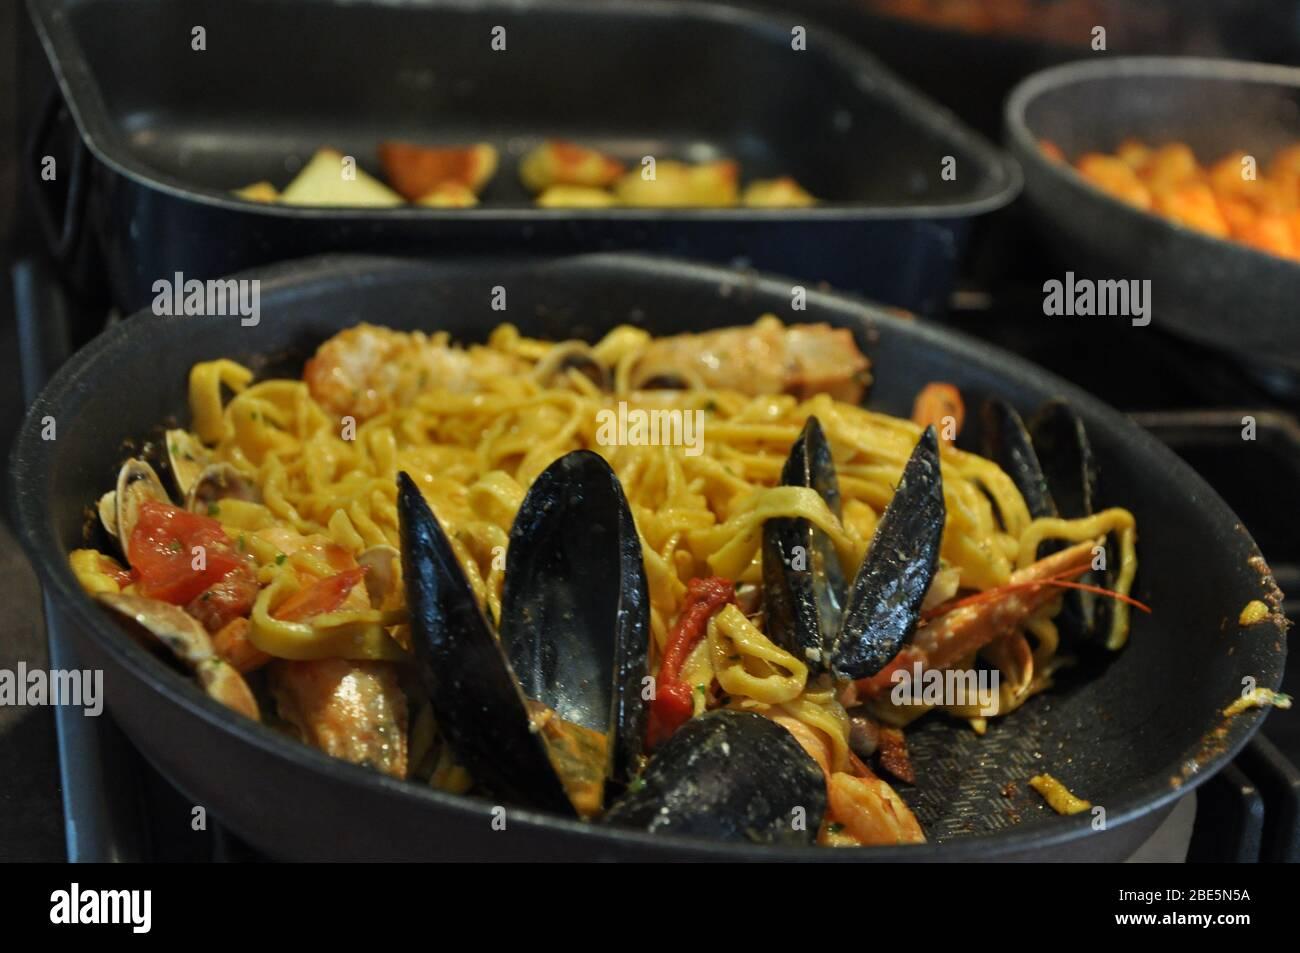 Tagliolini allo scoglio or spaghetti with seafood served i with shrimps and other shells Stock Photo